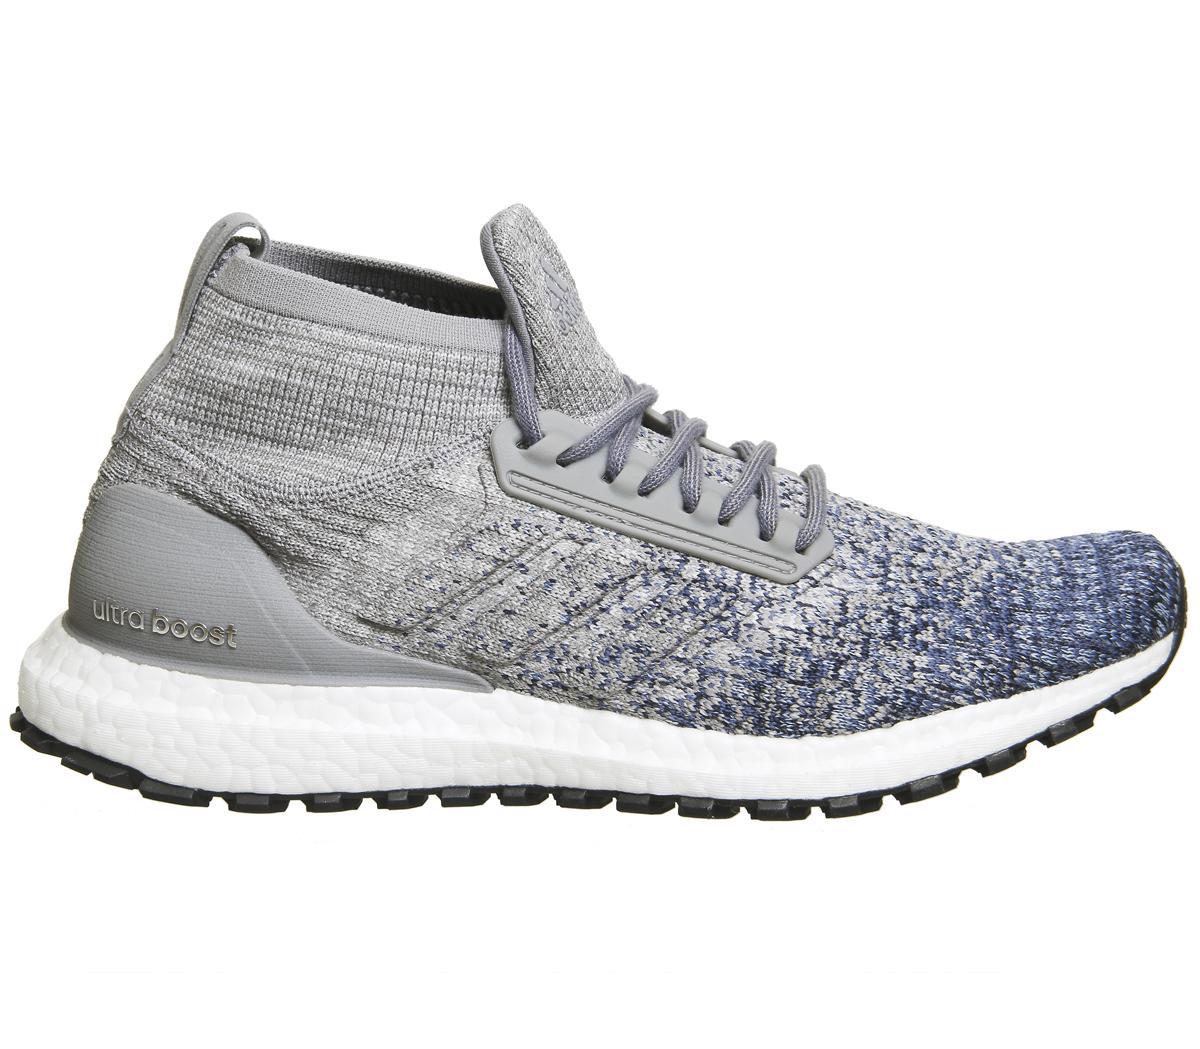 adidas Rubber Ultraboost All Terrain, Heather/grey/noble Indigo, 6.5 M Us in Grey for Men